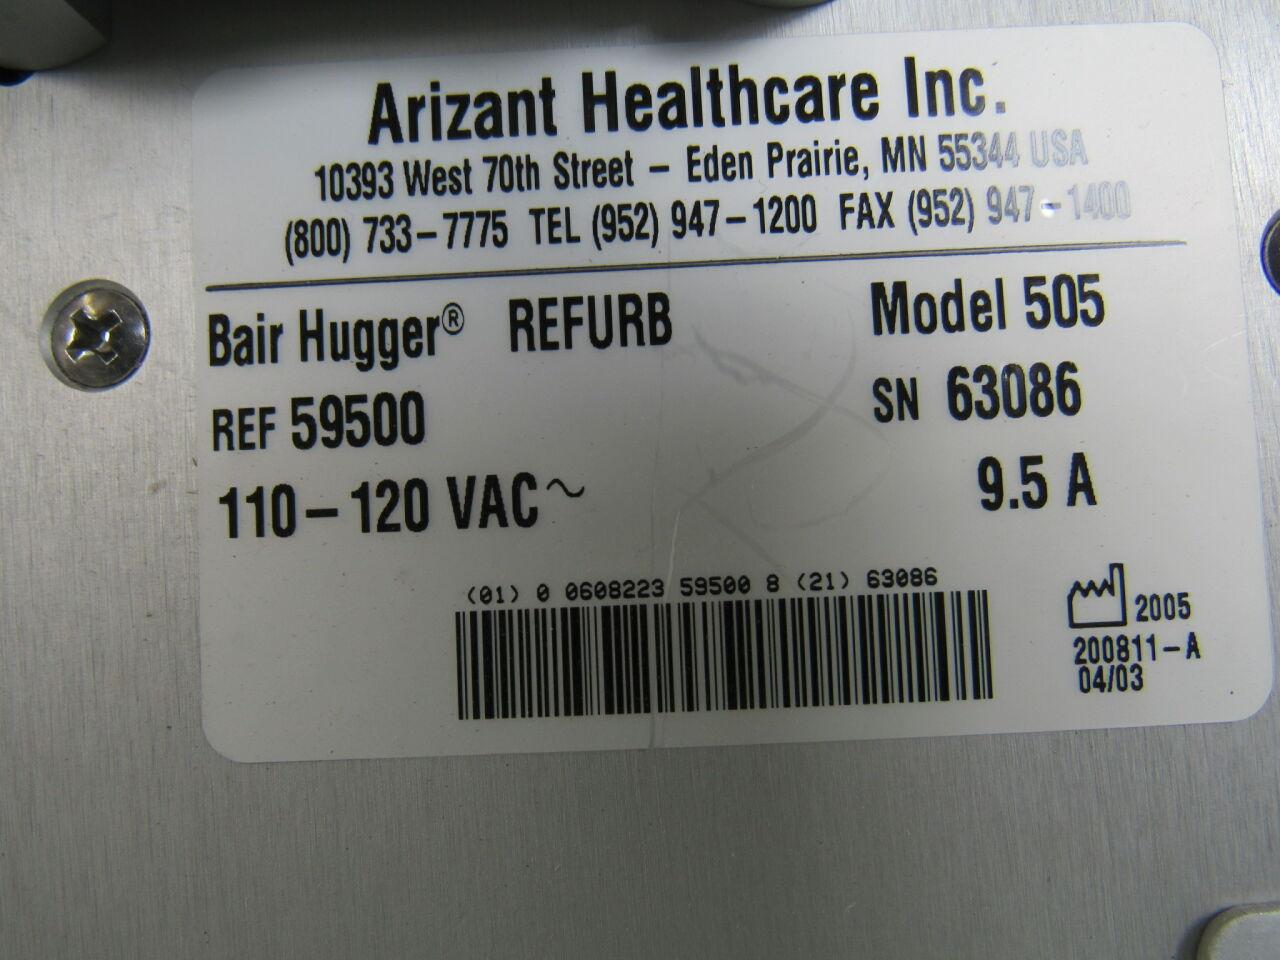 ARIZANT Bair Hugger 505 Patient Warmer